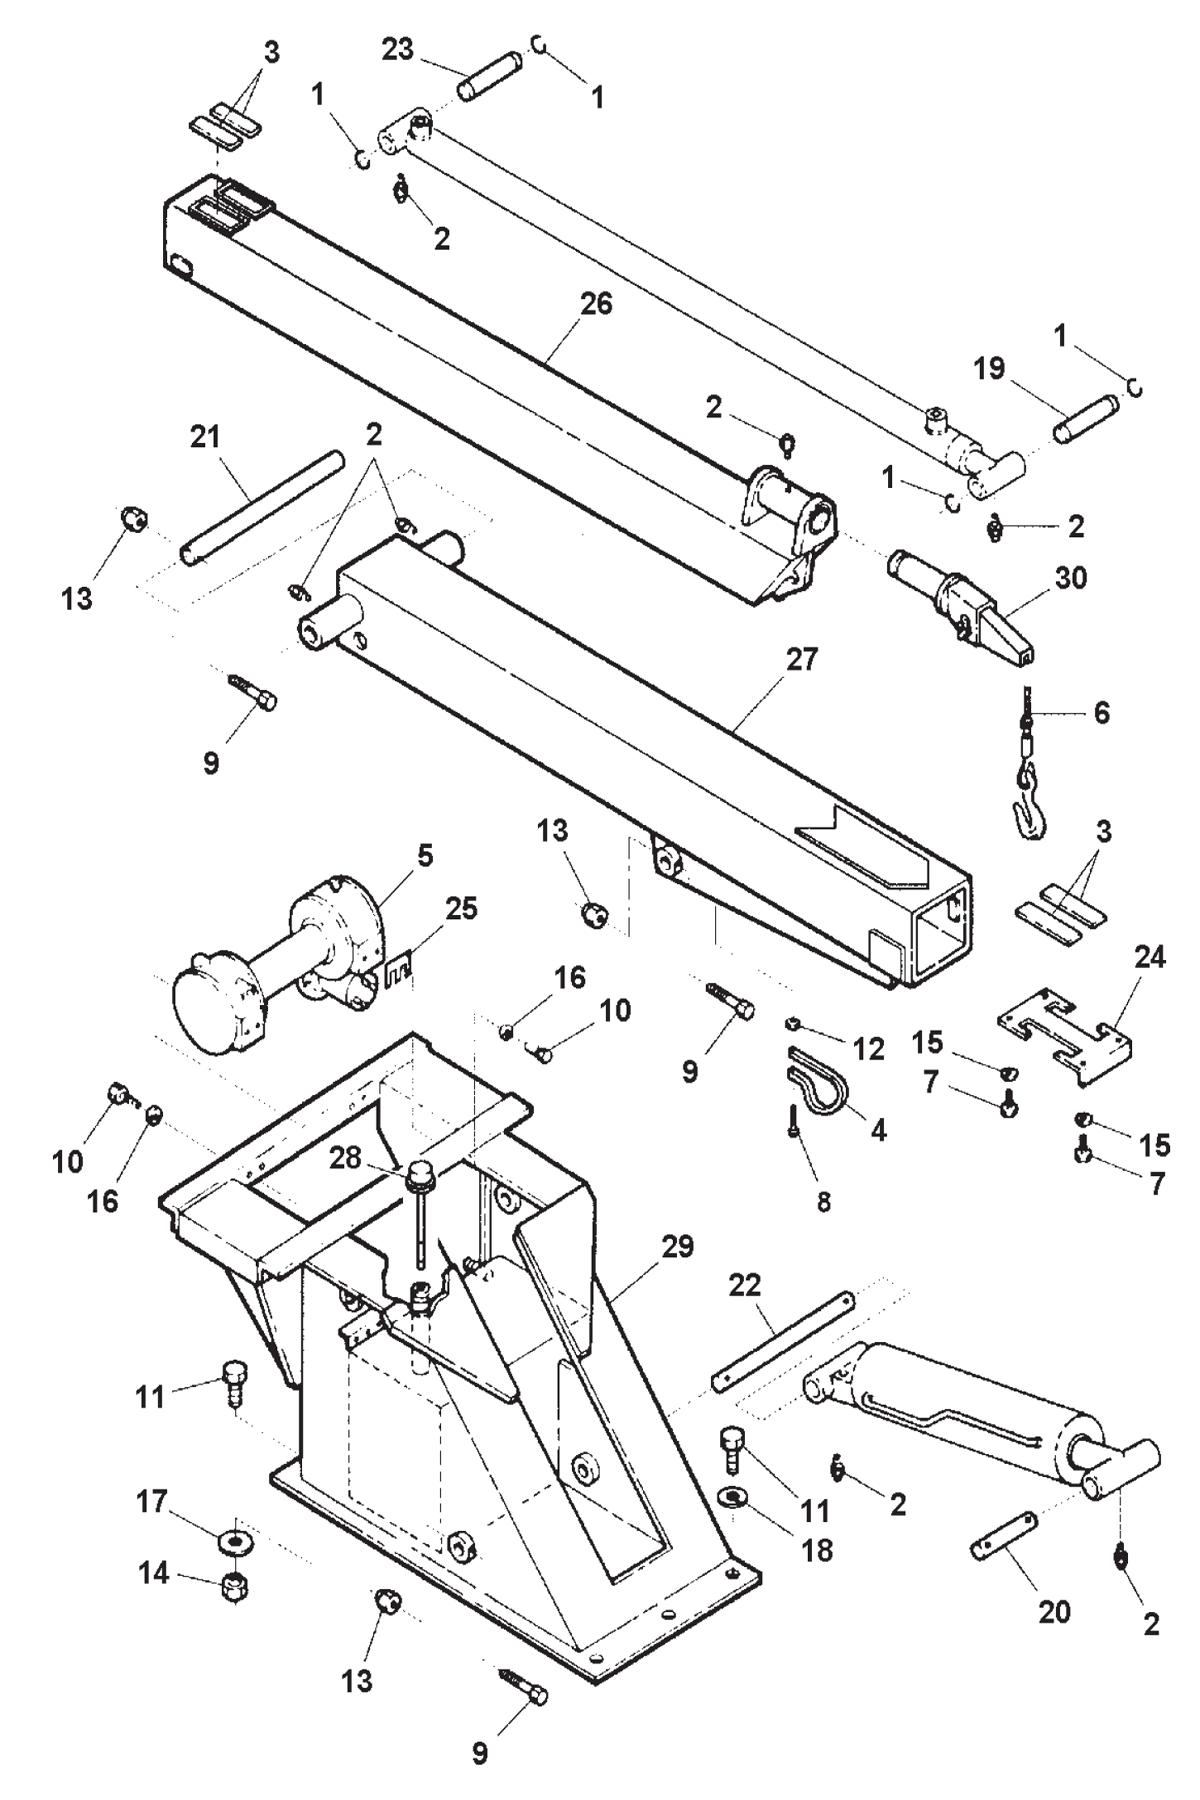 slc 500 wiring diagram slc 500 chassis wiring diagram